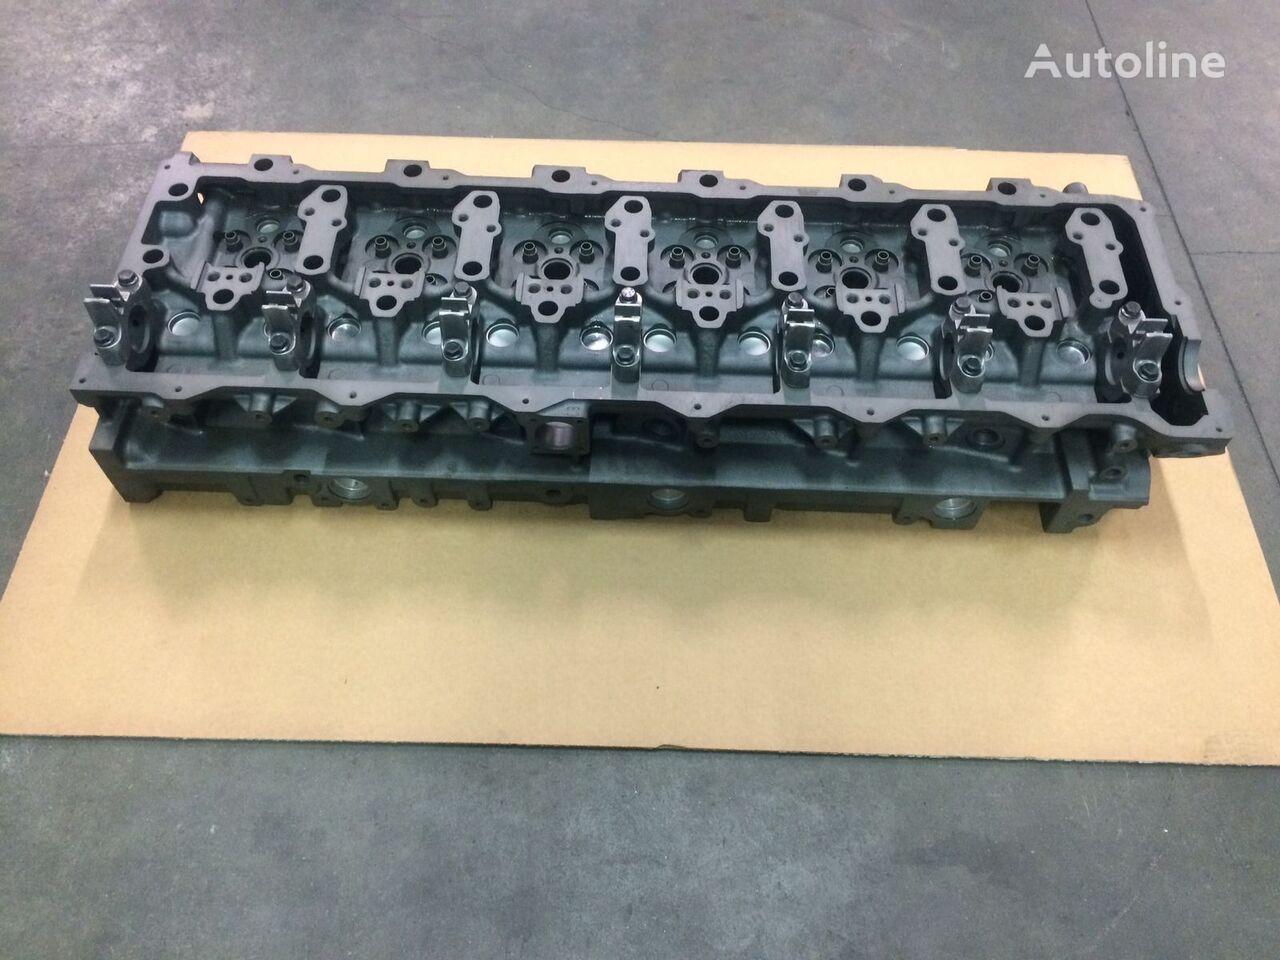 testata motore MAN D2066 / D2676 - NUDA / COMPLETA DI VALVOLE - per bus e per camion MAN